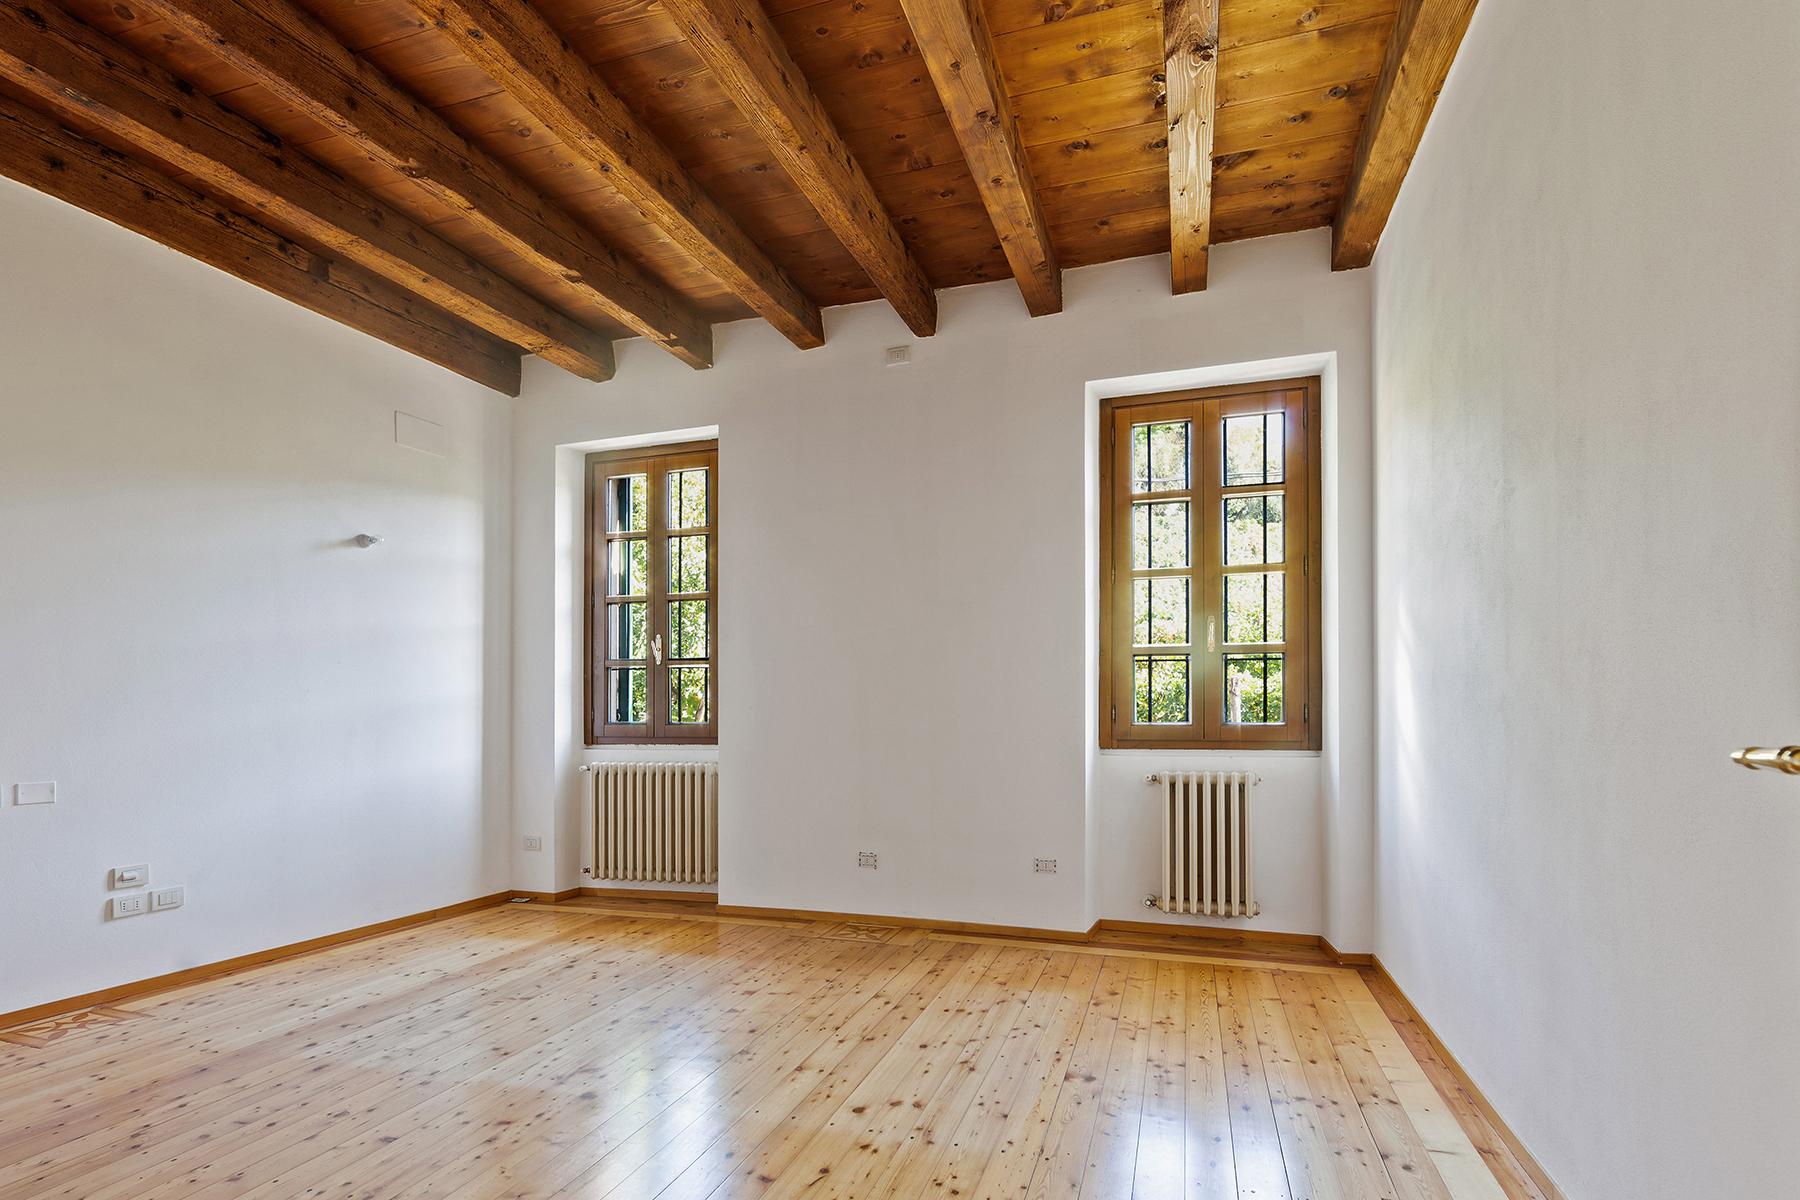 Villa in Vendita a Verona: 5 locali, 890 mq - Foto 23